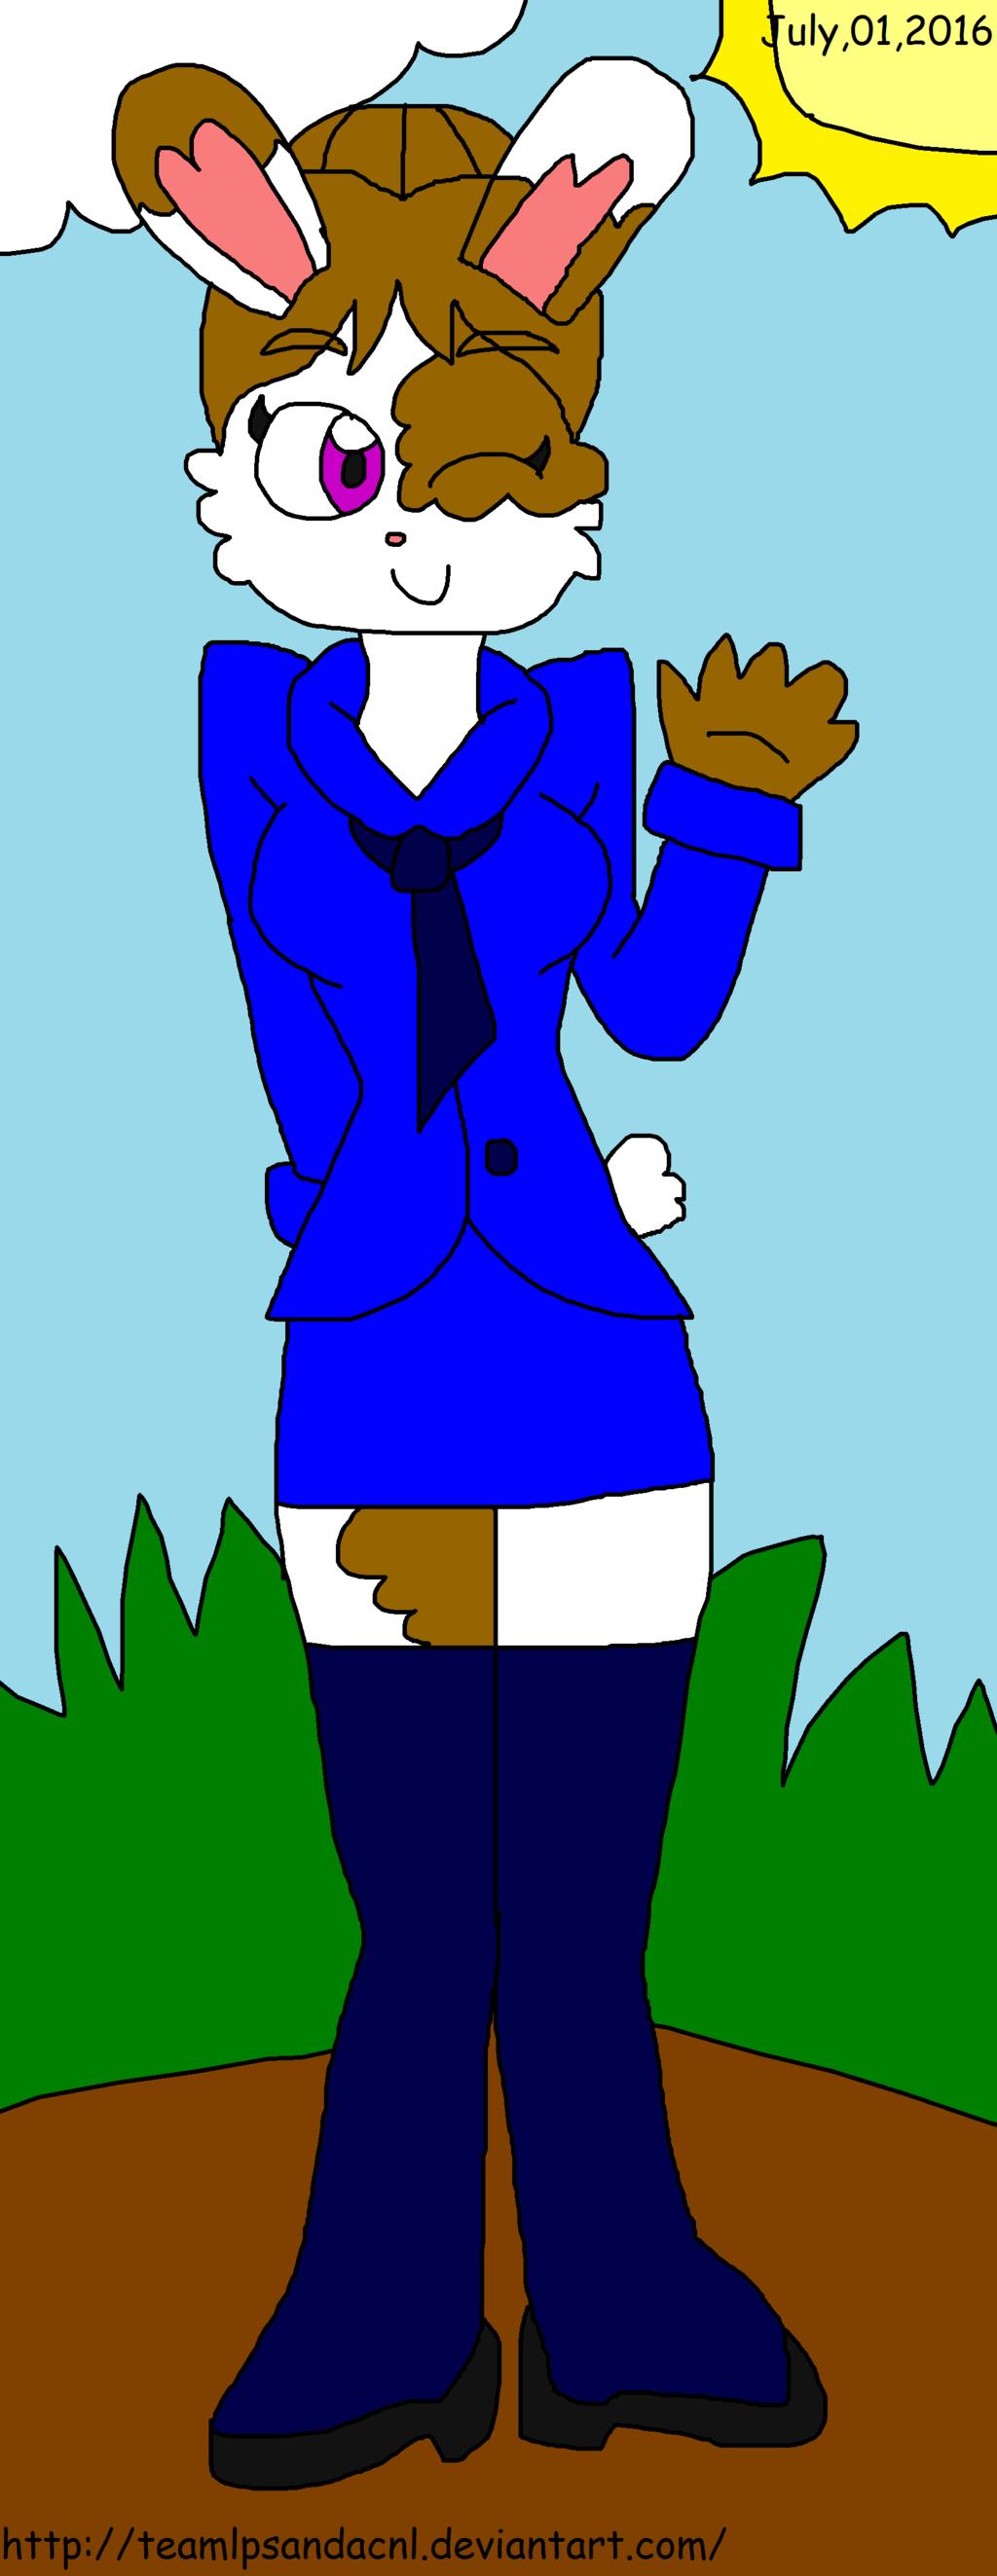 Bonnie Rabbitine Petropolis Newswoman by teamlpsandacnl on DeviantArt.